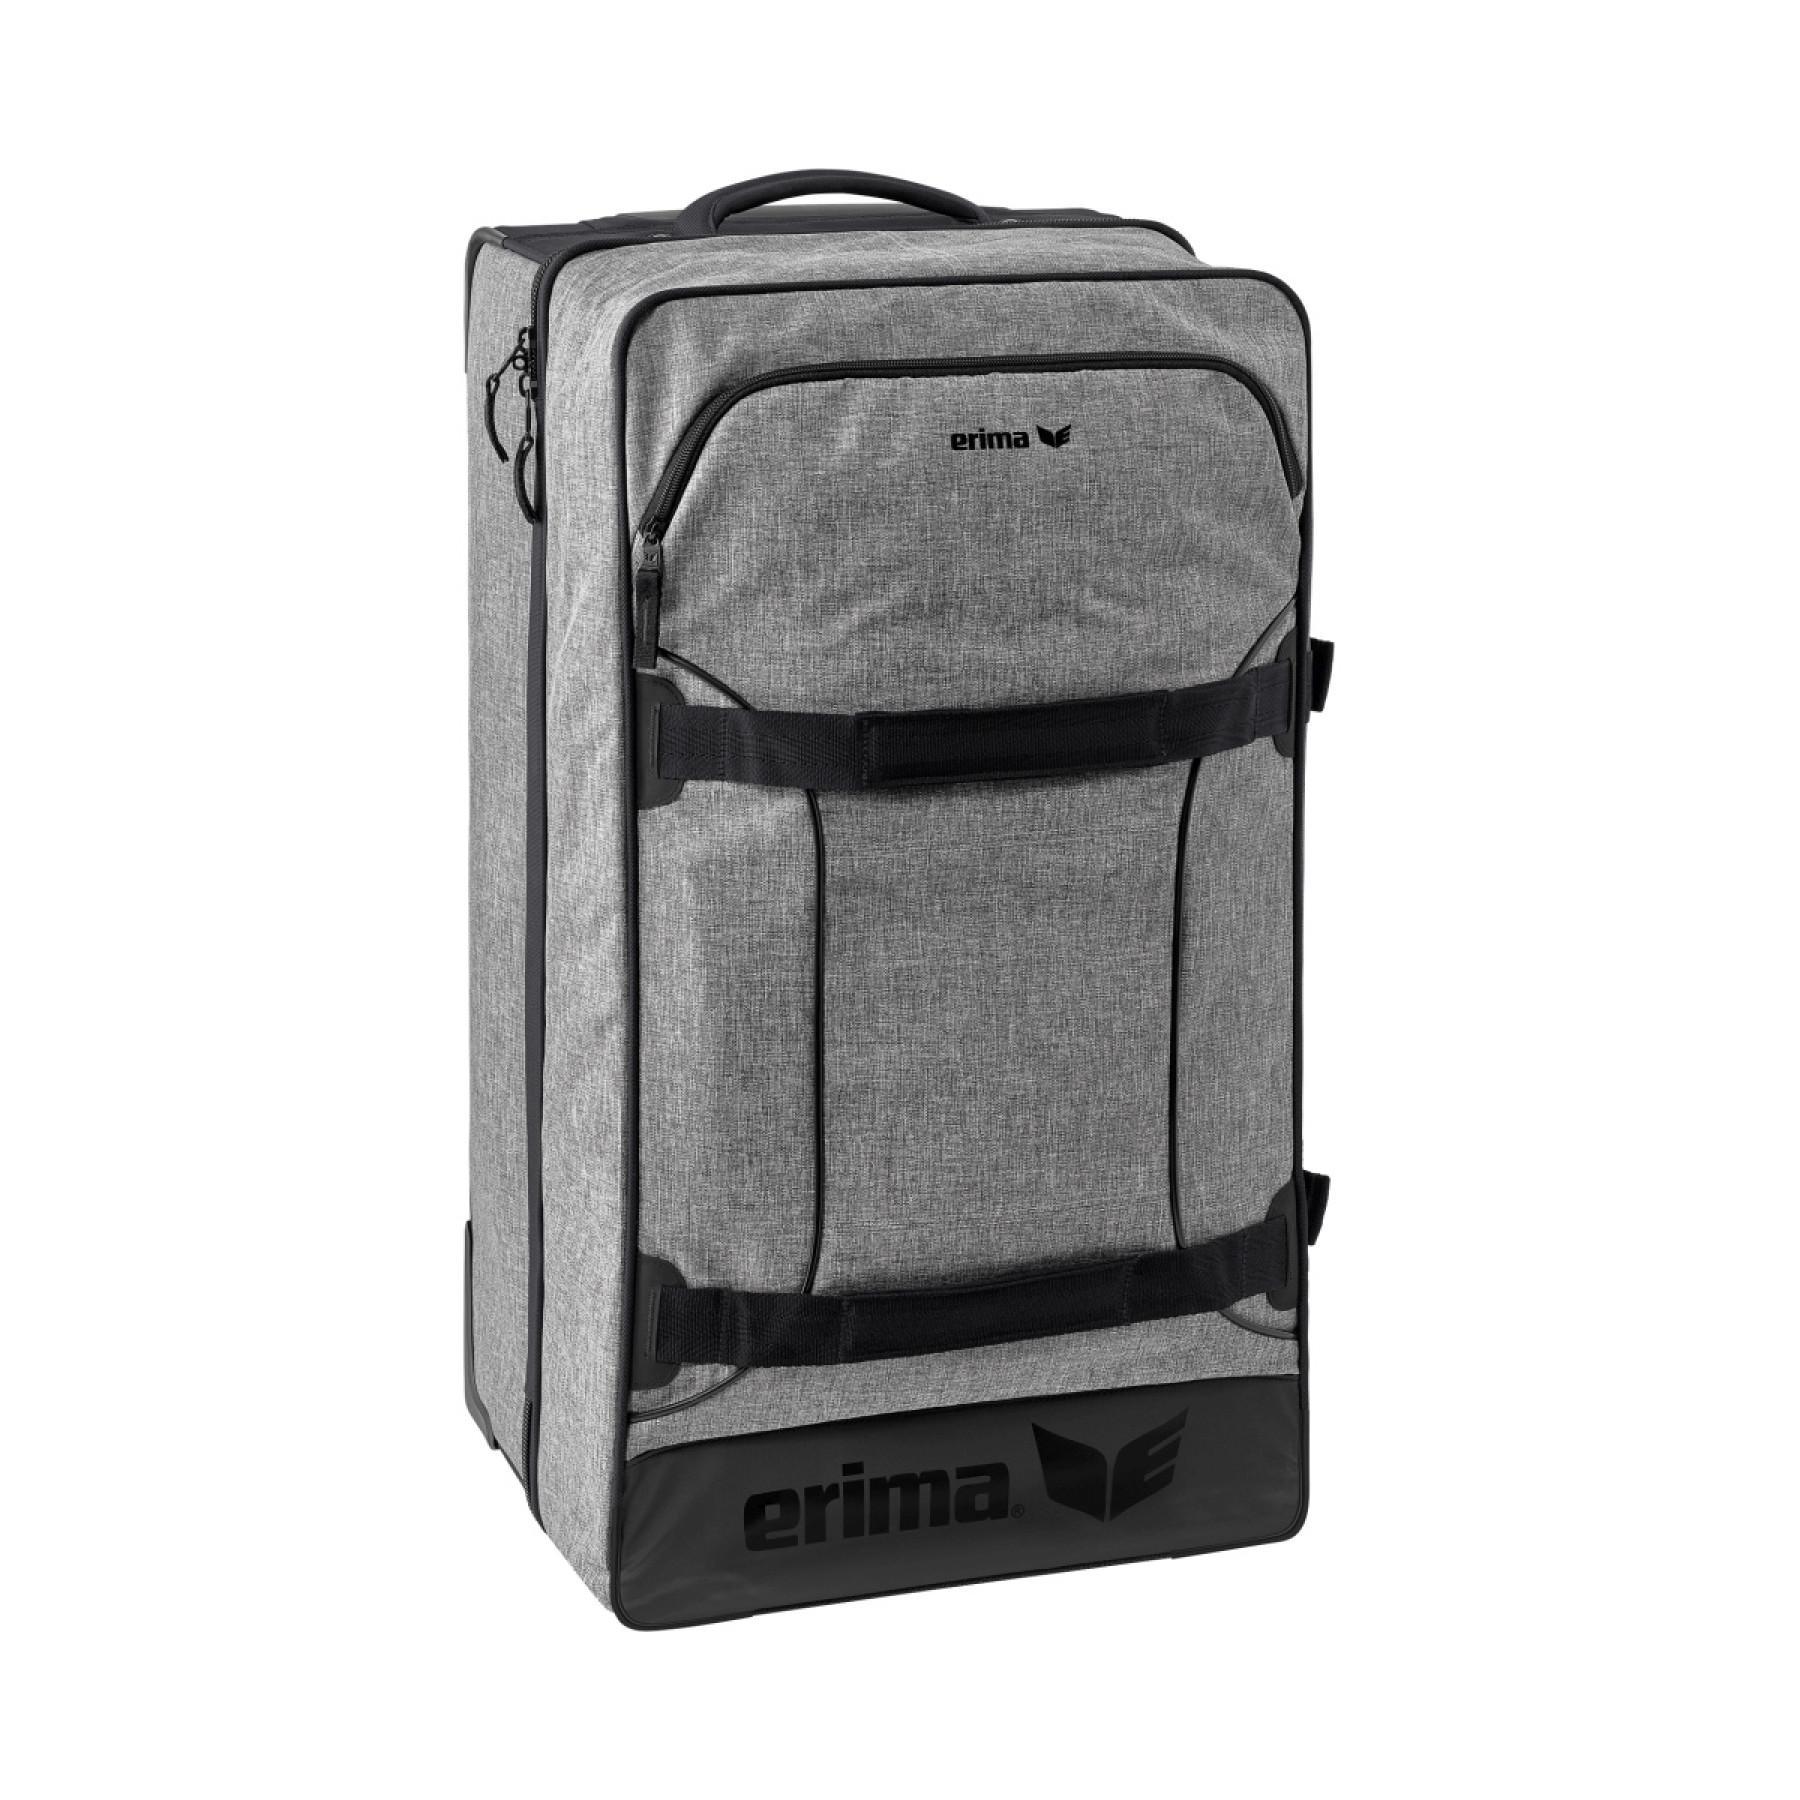 Trolley Bag Erima travel